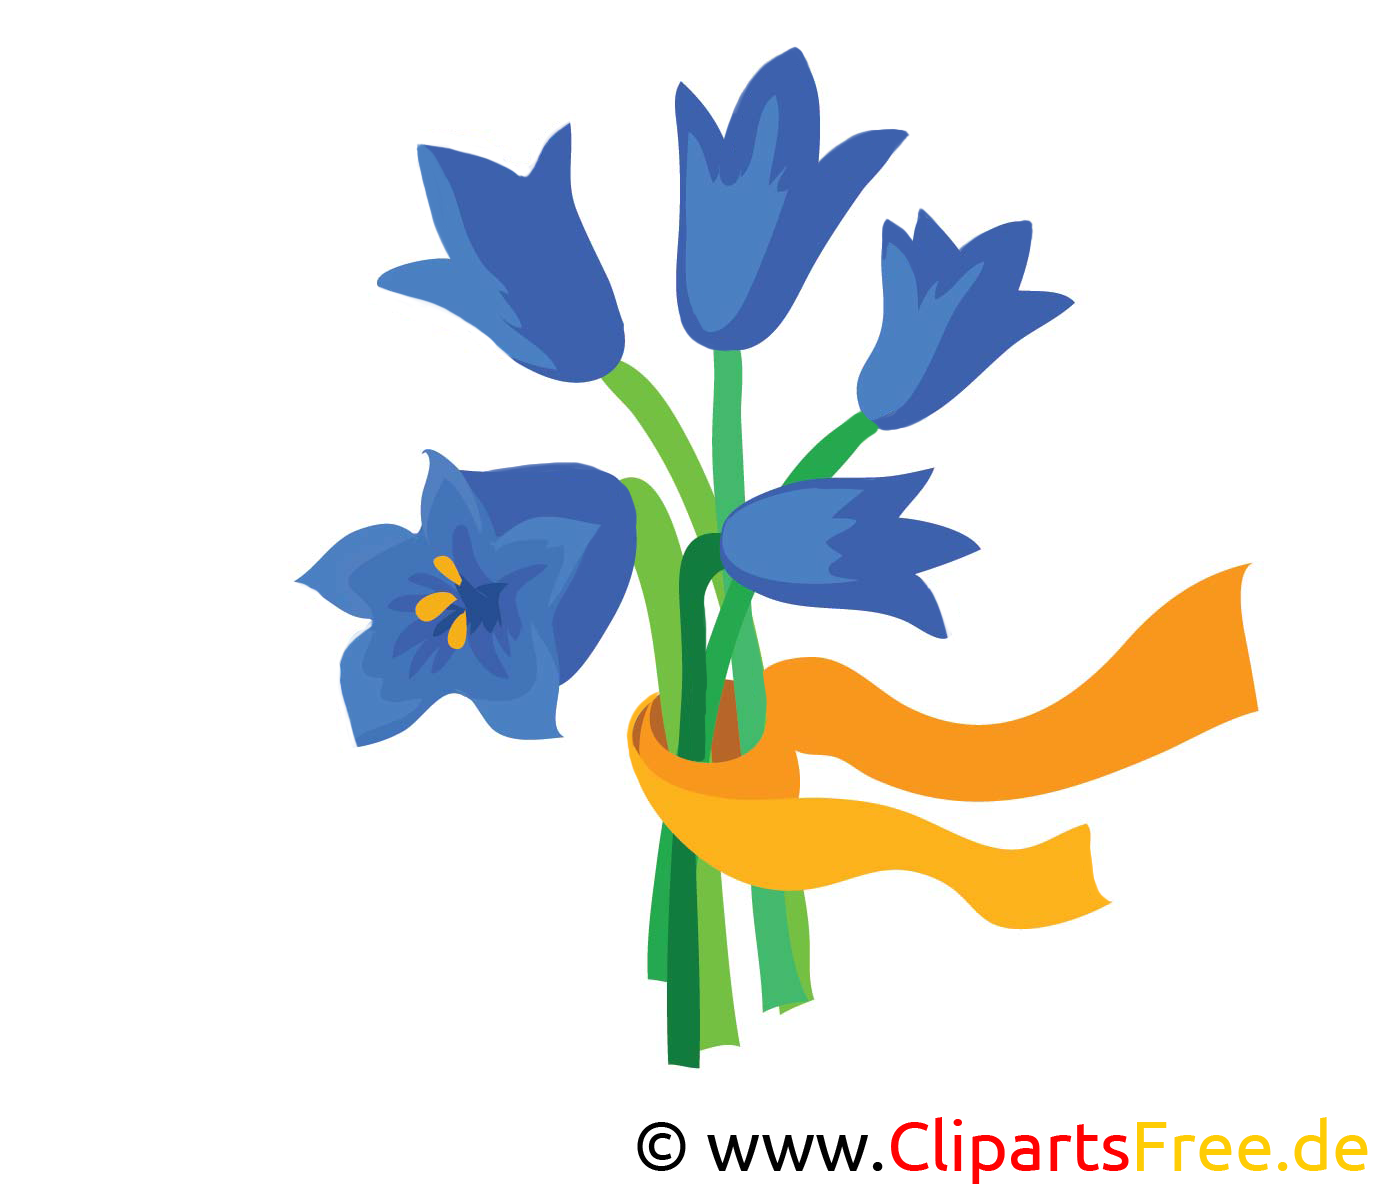 Glockenblumen Bild, Clipart, Illustration, Grafik